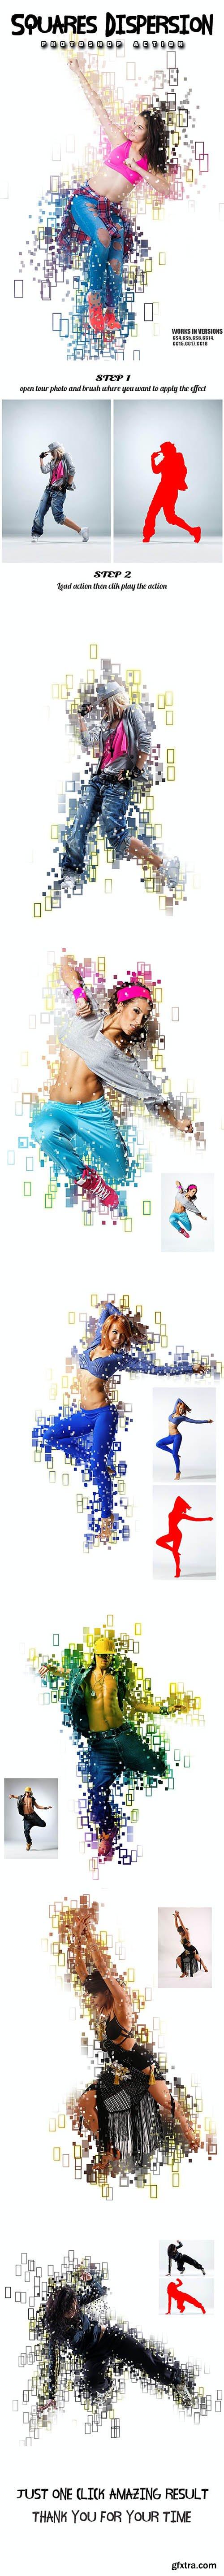 GraphicRiver - Squares Dispersion Photoshop Action 26351103